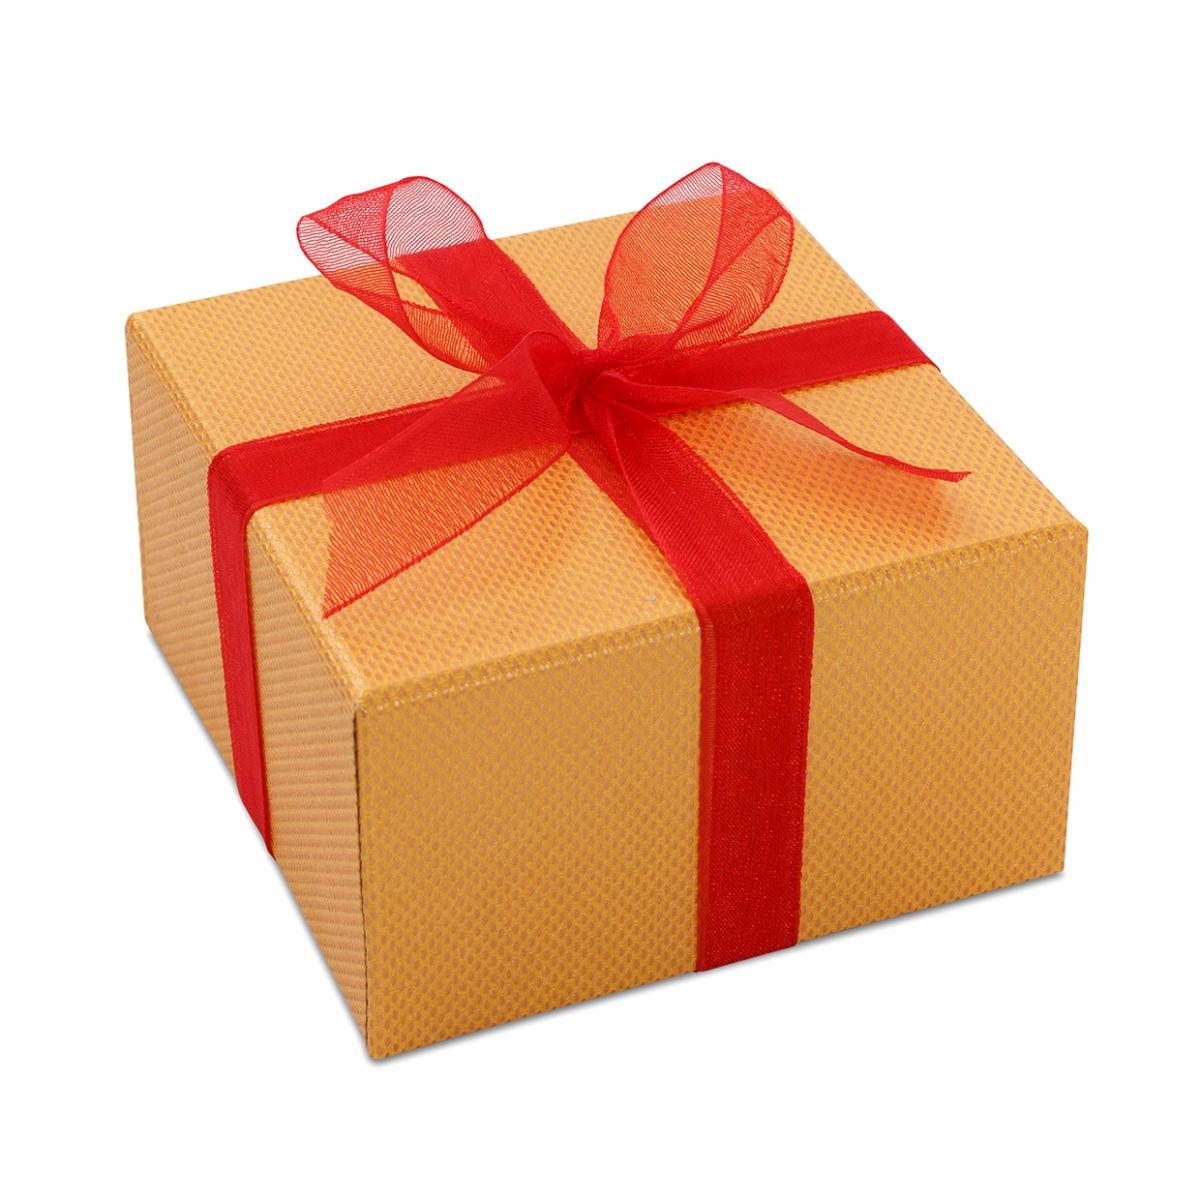 Imagen en la que se ve un paquete de regalo